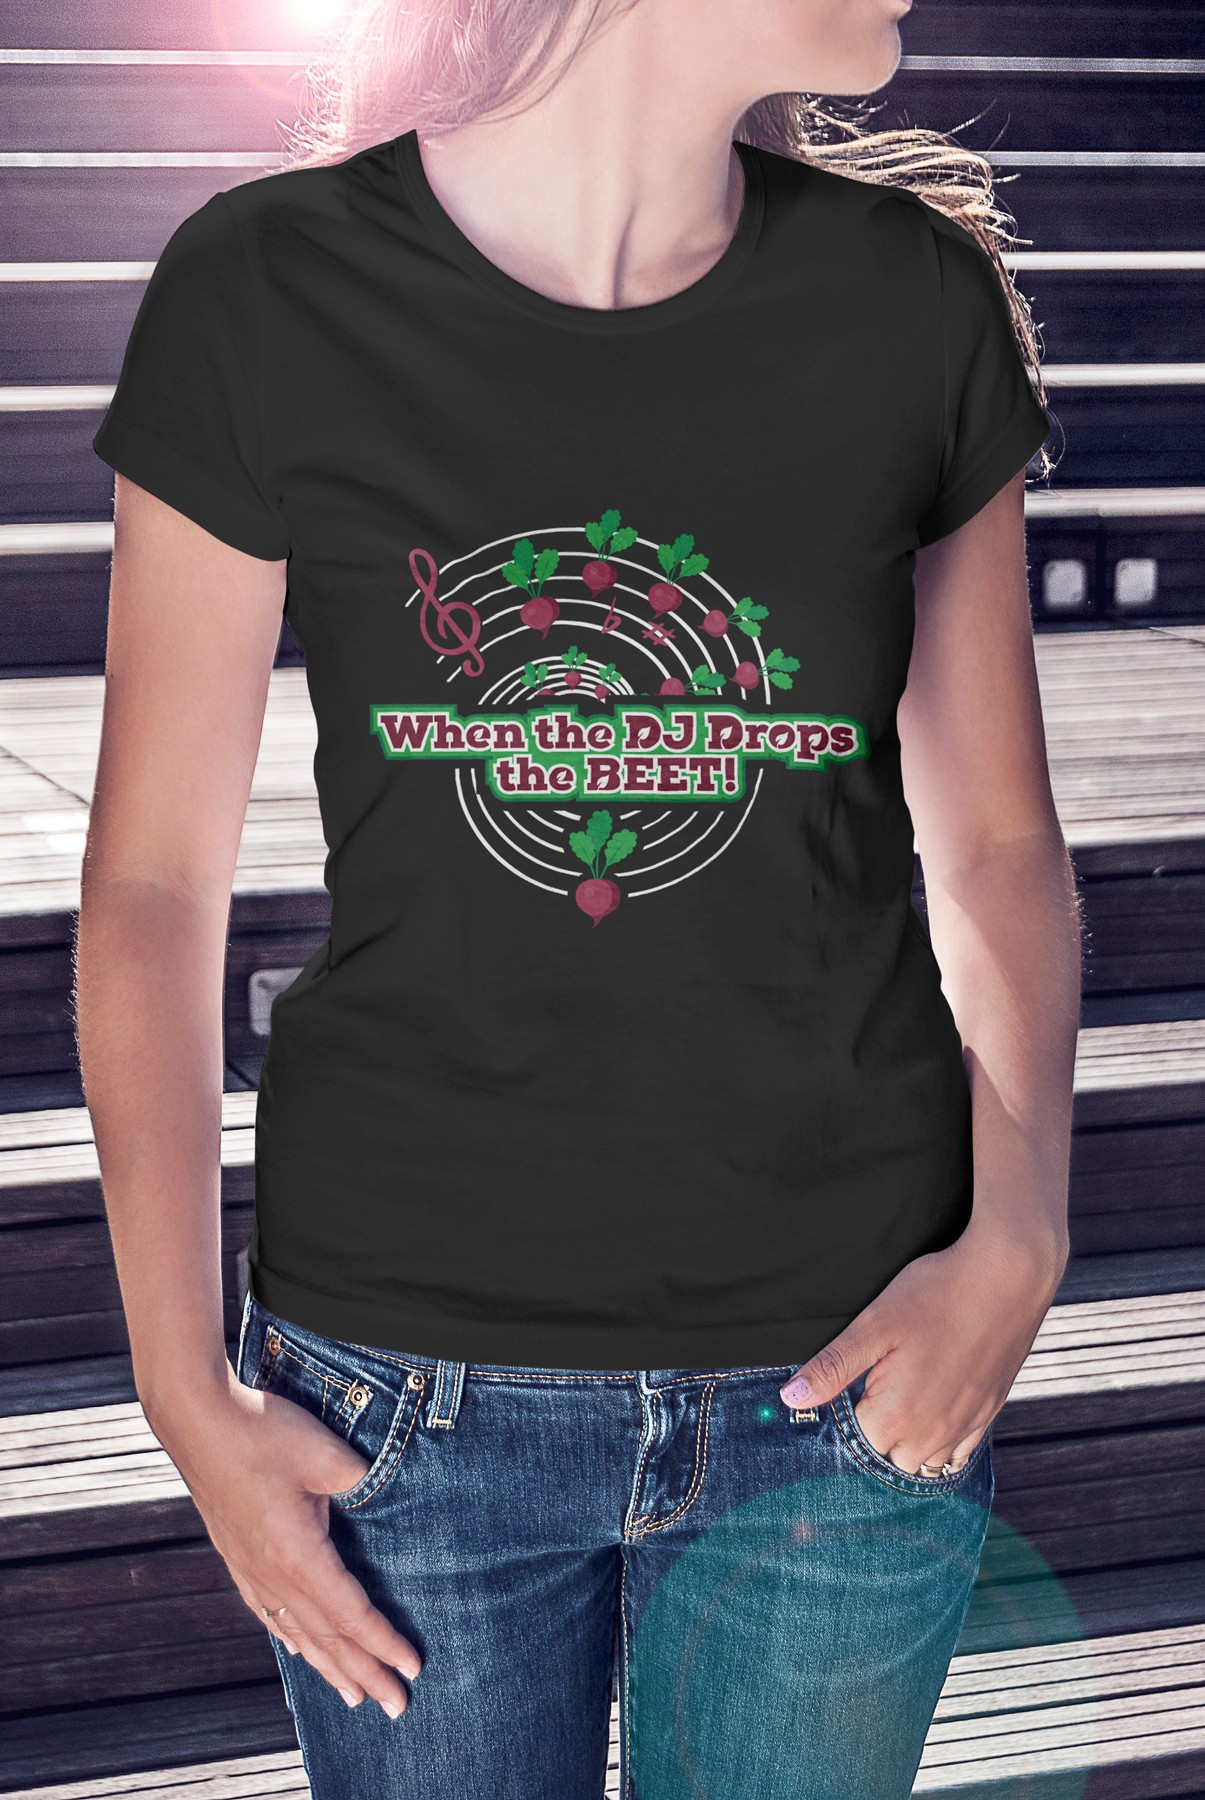 Vegan T Shirt design